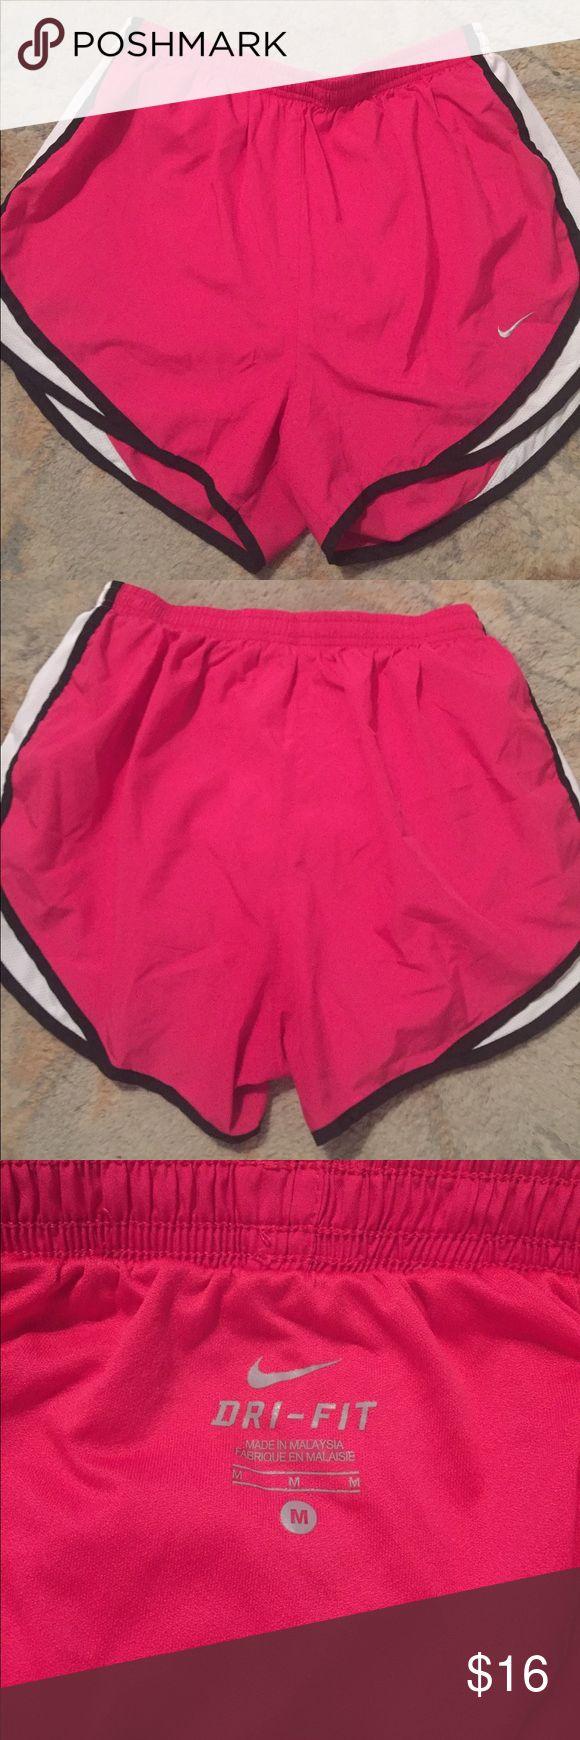 Nike Shorts Women's Nike Shorts in Pink and Black - EUC. Nike Shorts